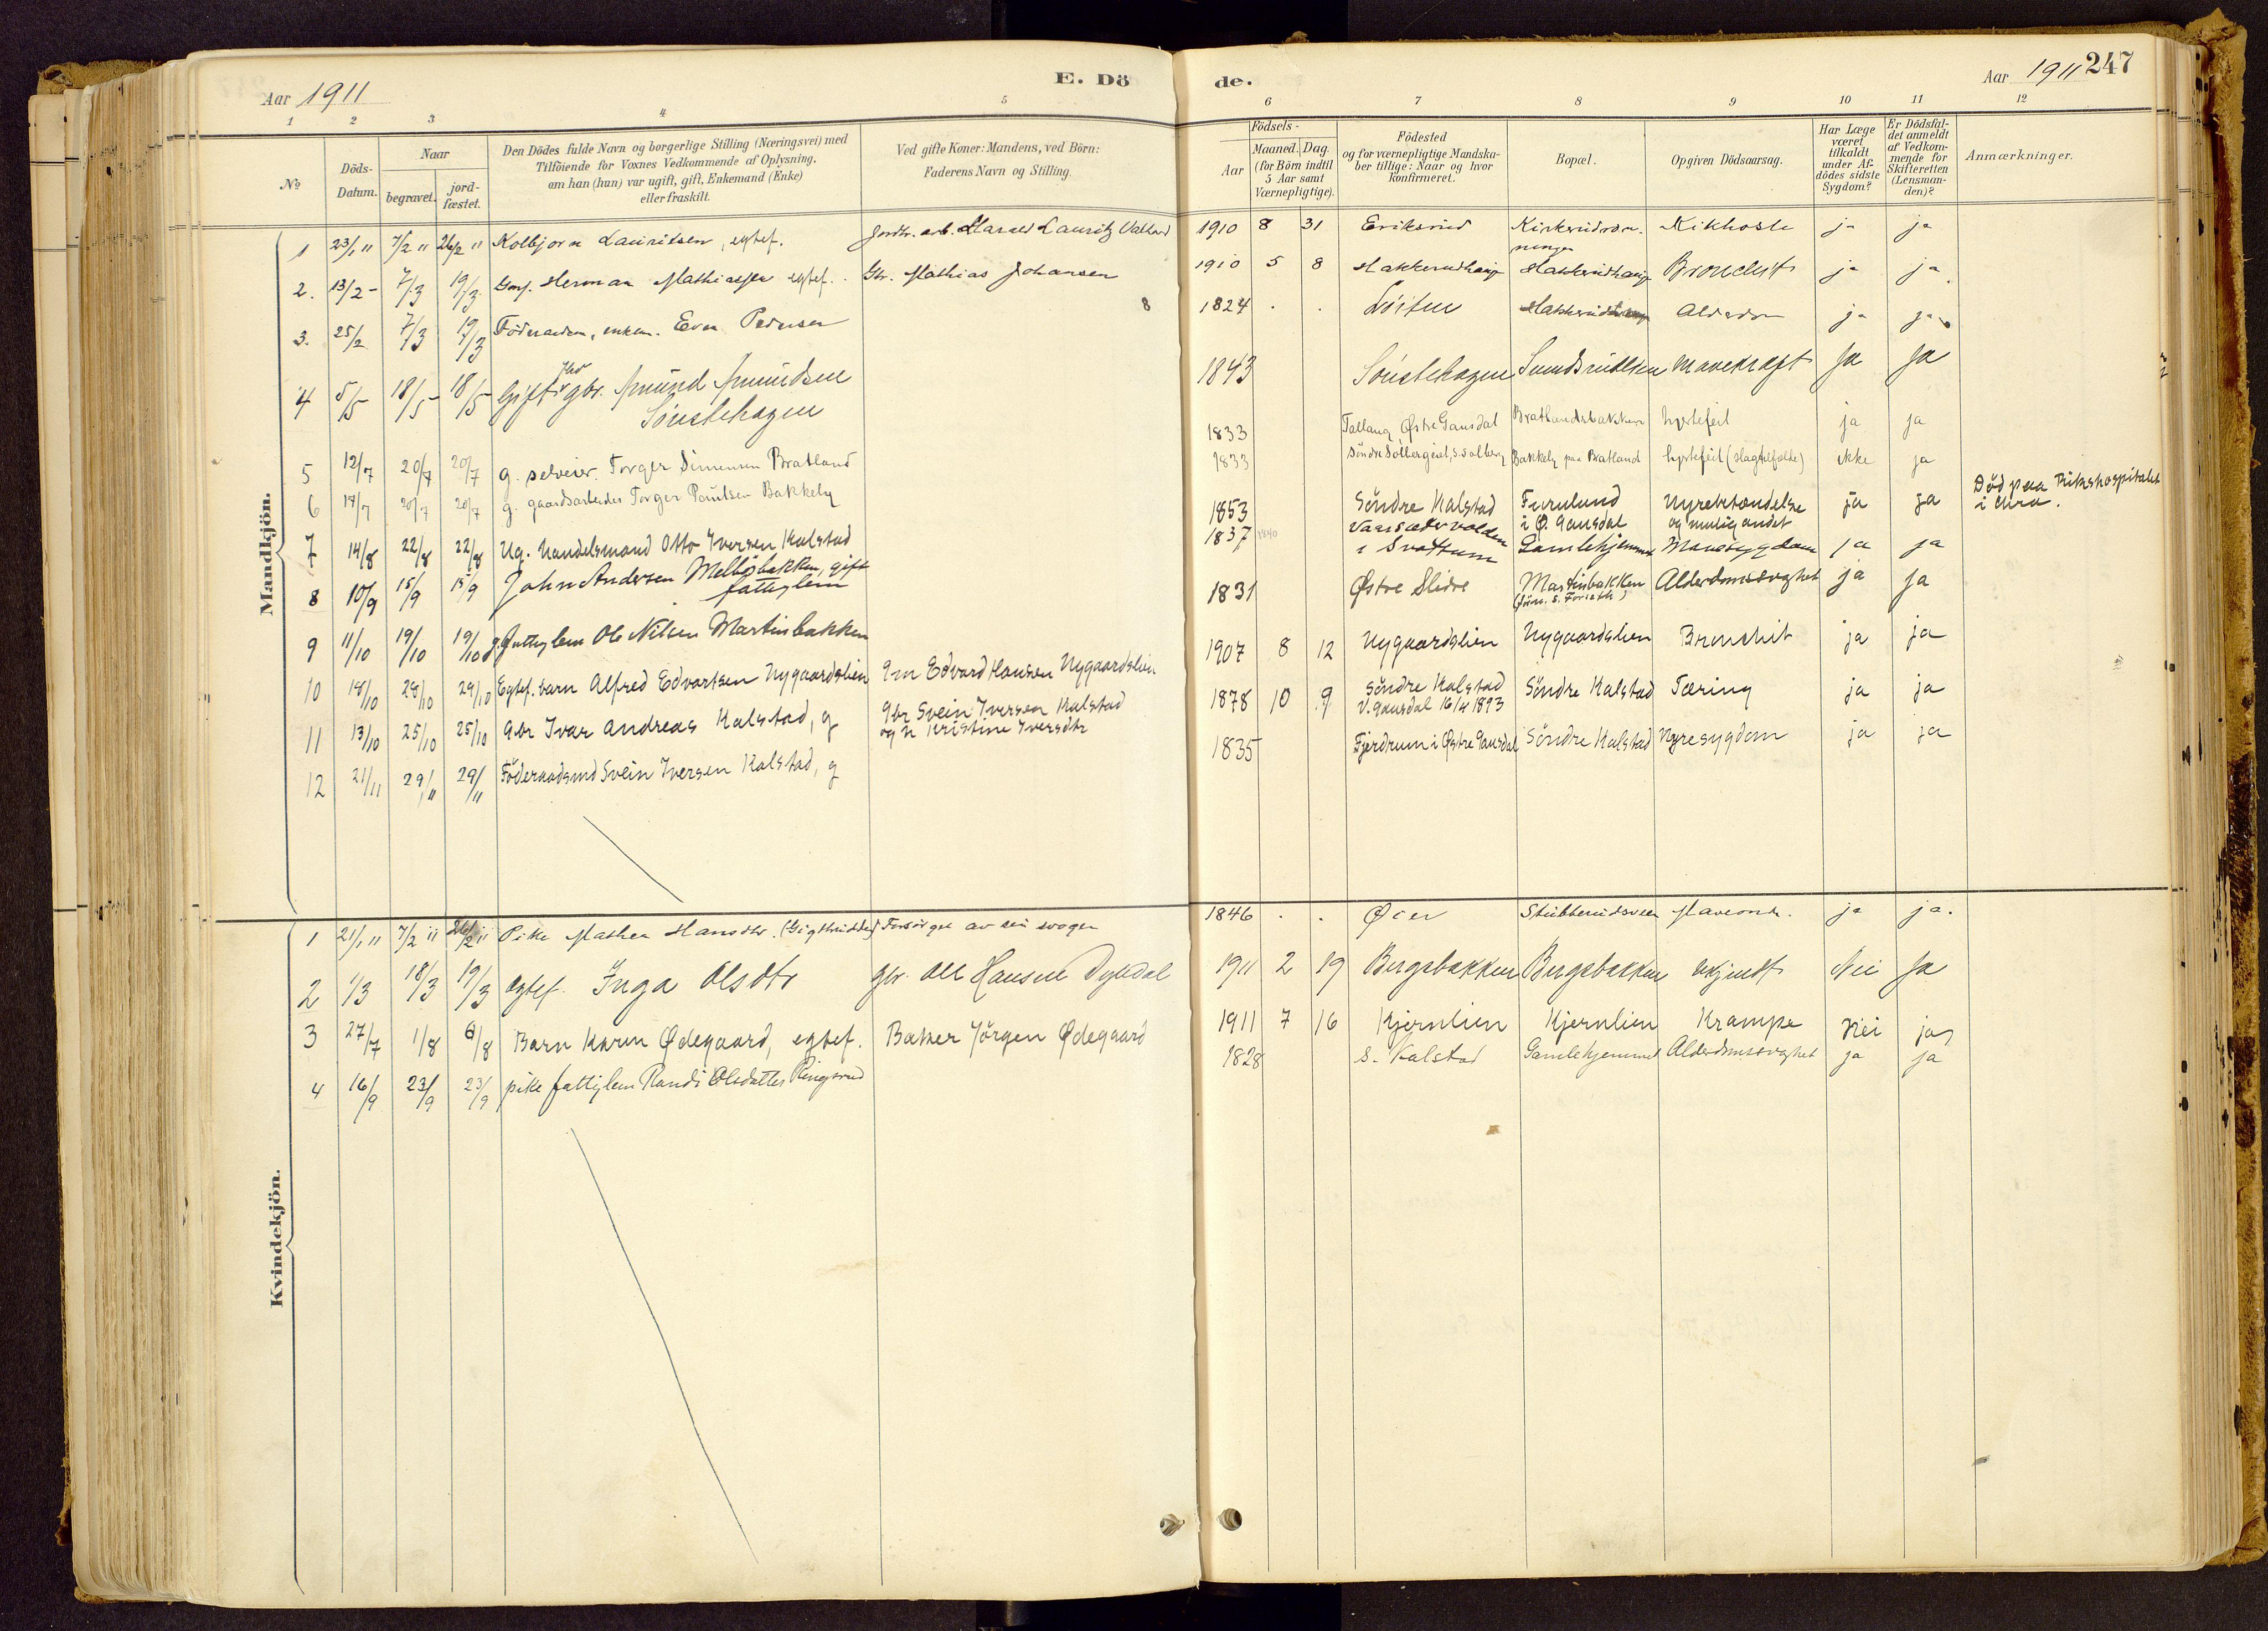 SAH, Vestre Gausdal prestekontor, Ministerialbok nr. 1, 1887-1914, s. 247